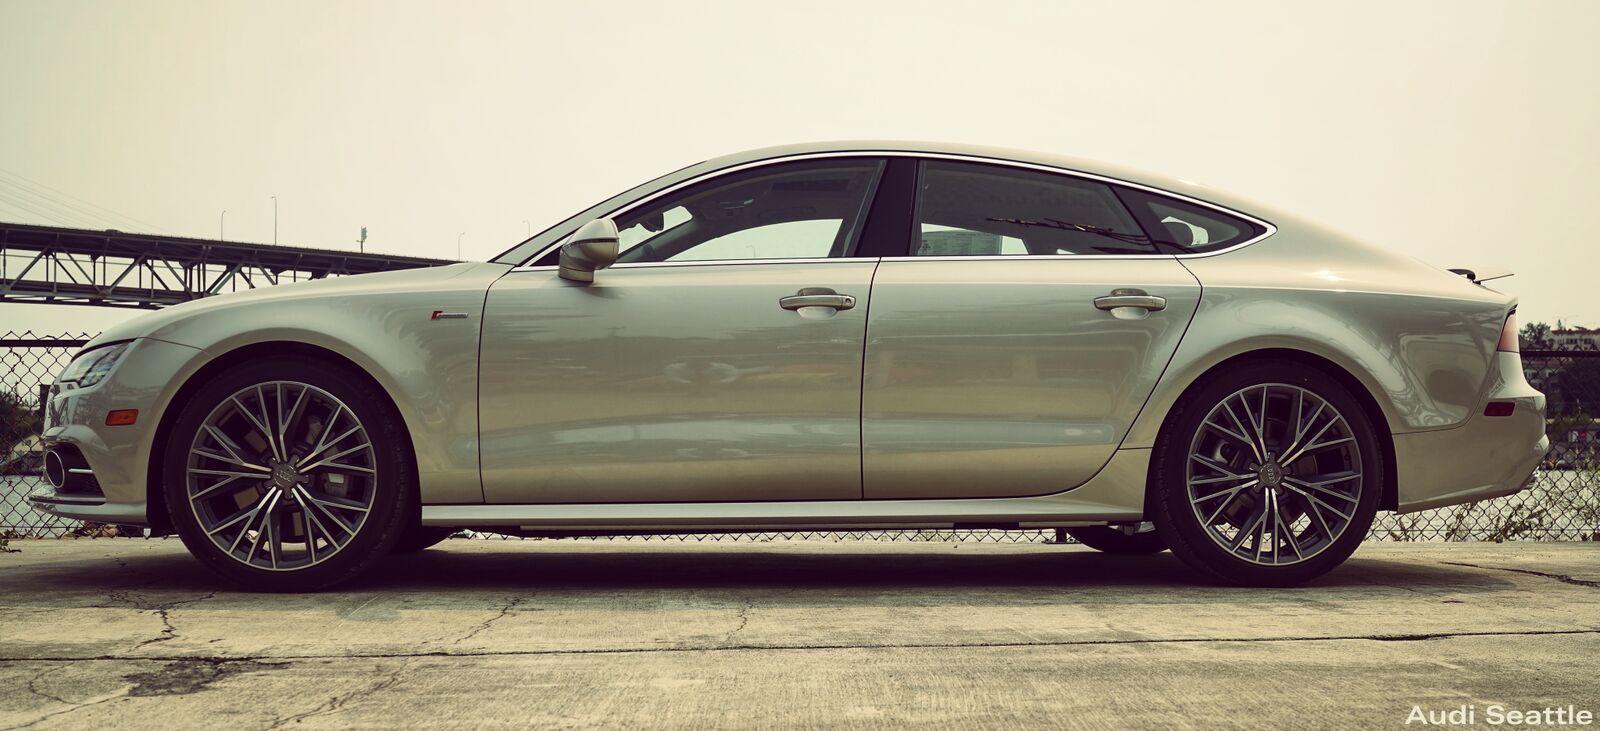 2016 Cuvee A7 Audi Seattle U District Seattle Wa Audiseattle Com Audi Audi Cars Luxury Car Dealership